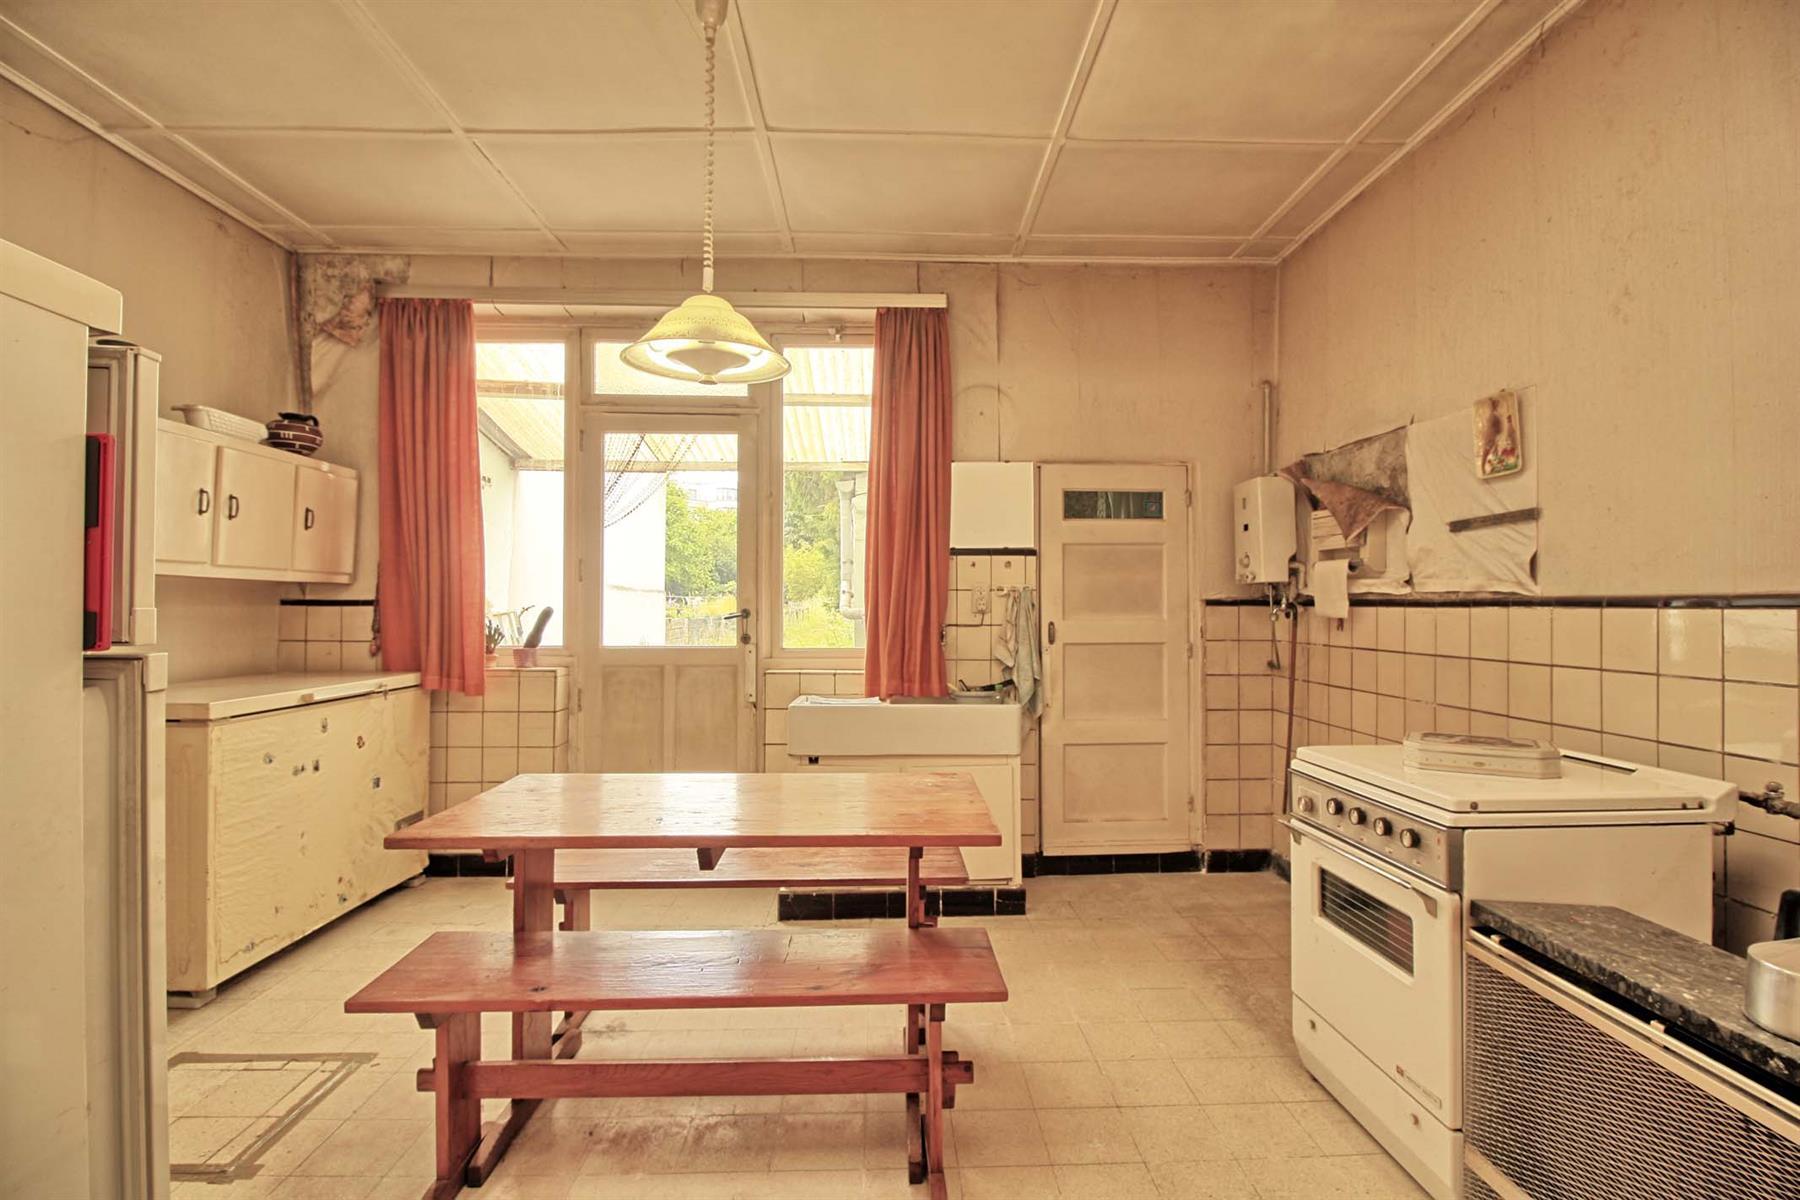 Eengezinswoning - Woluwe-Saint-Lambert - #4106876-1